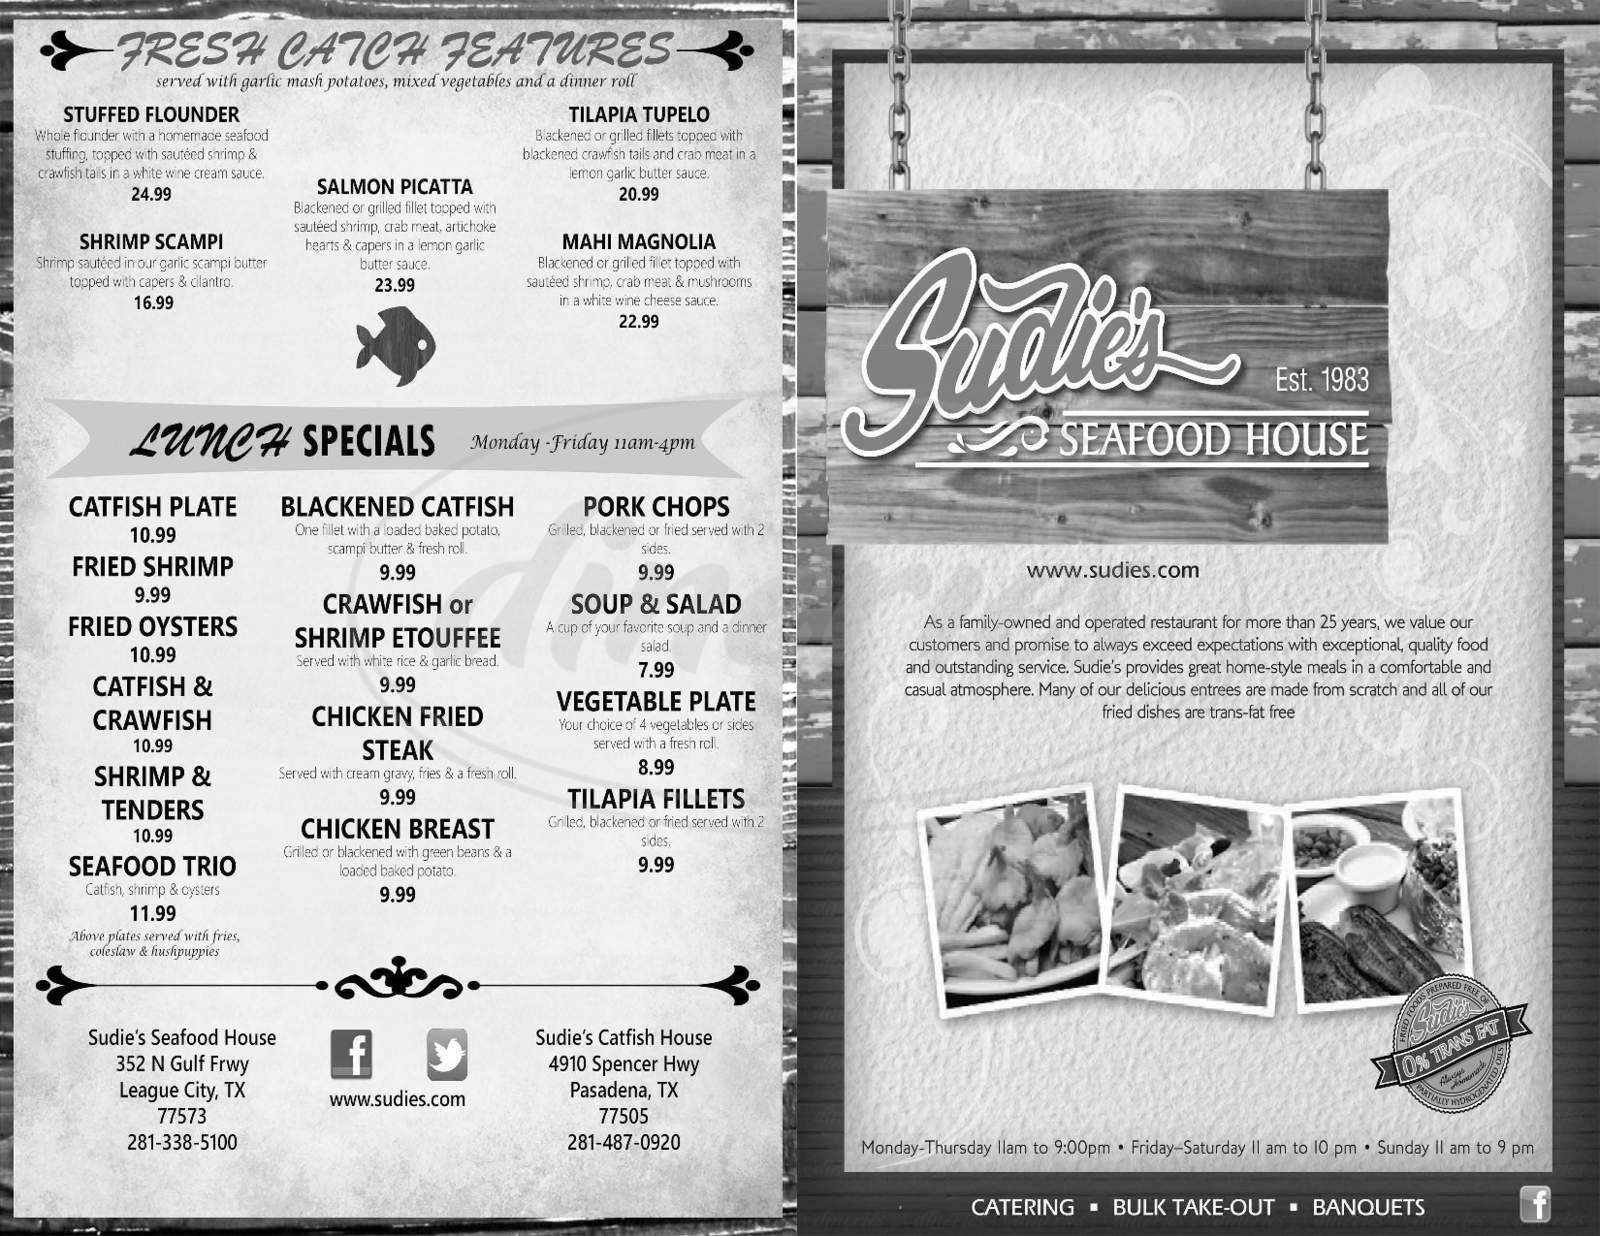 menu for Sudie's